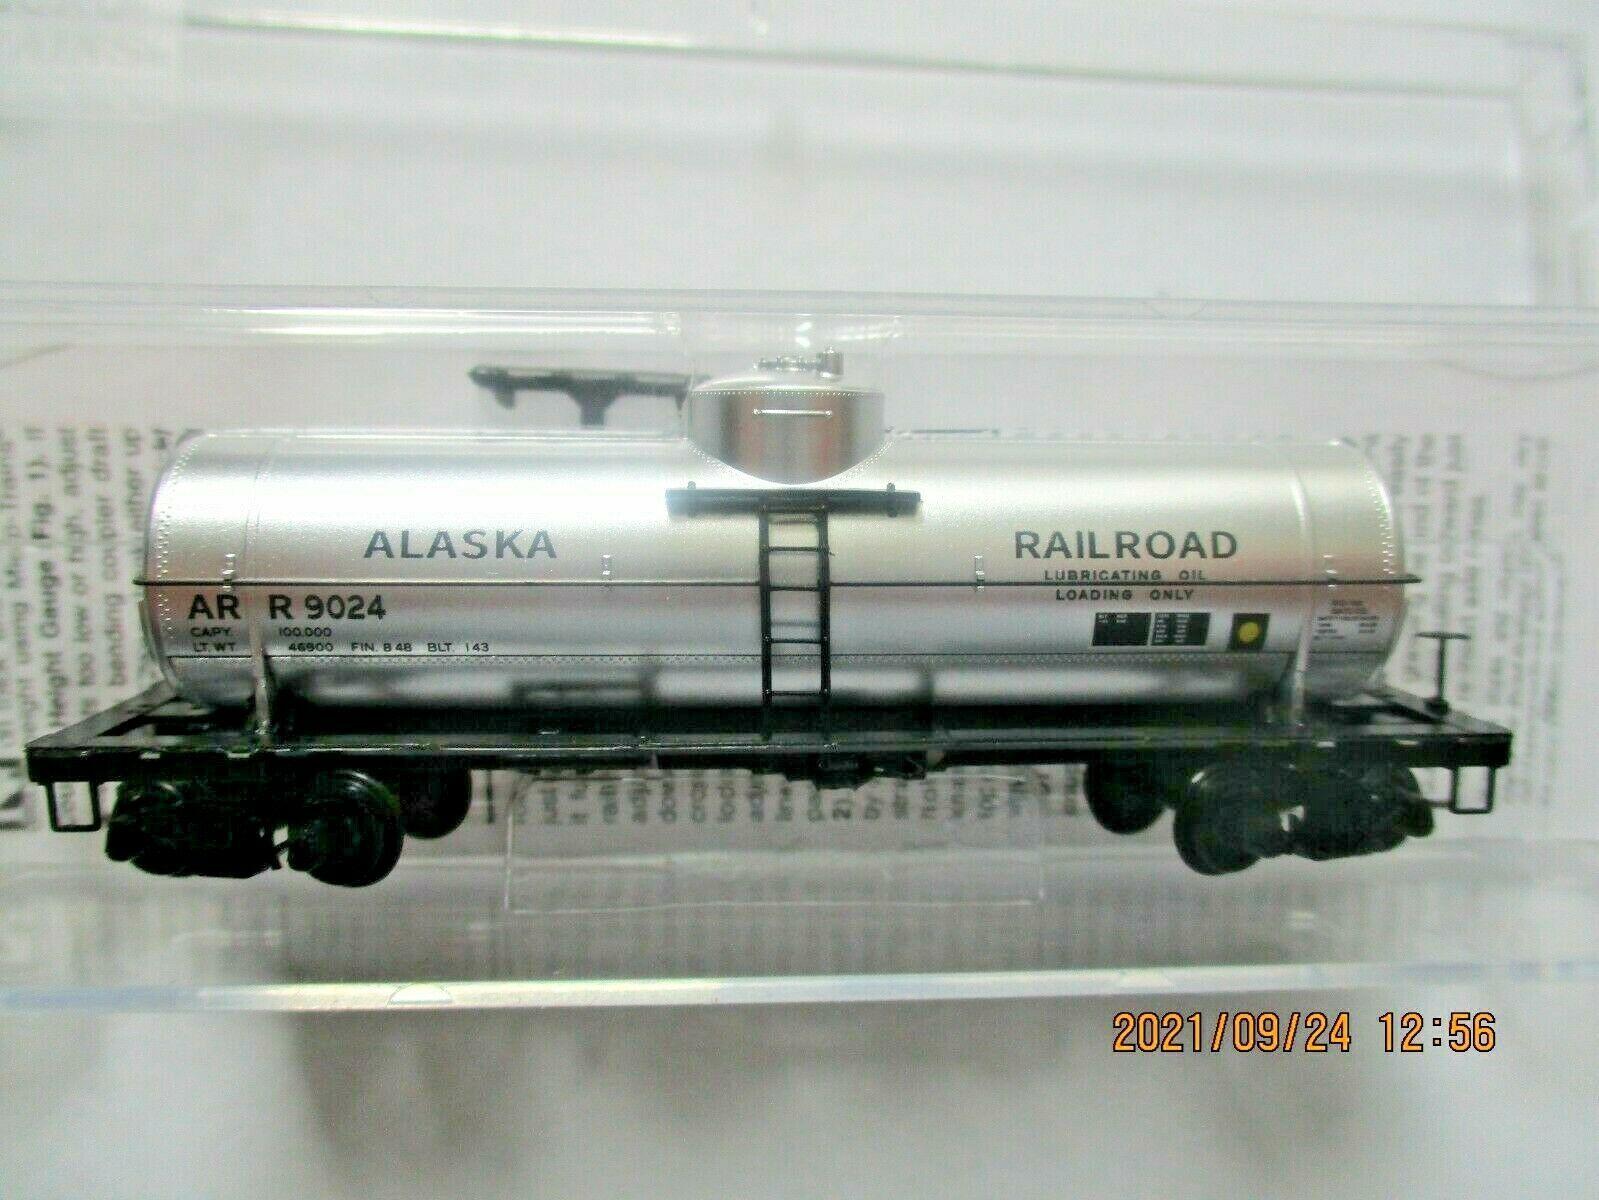 Micro-Trains # 06500256 Alaska Railroad 39' Single Dome Tank Car N-Scale